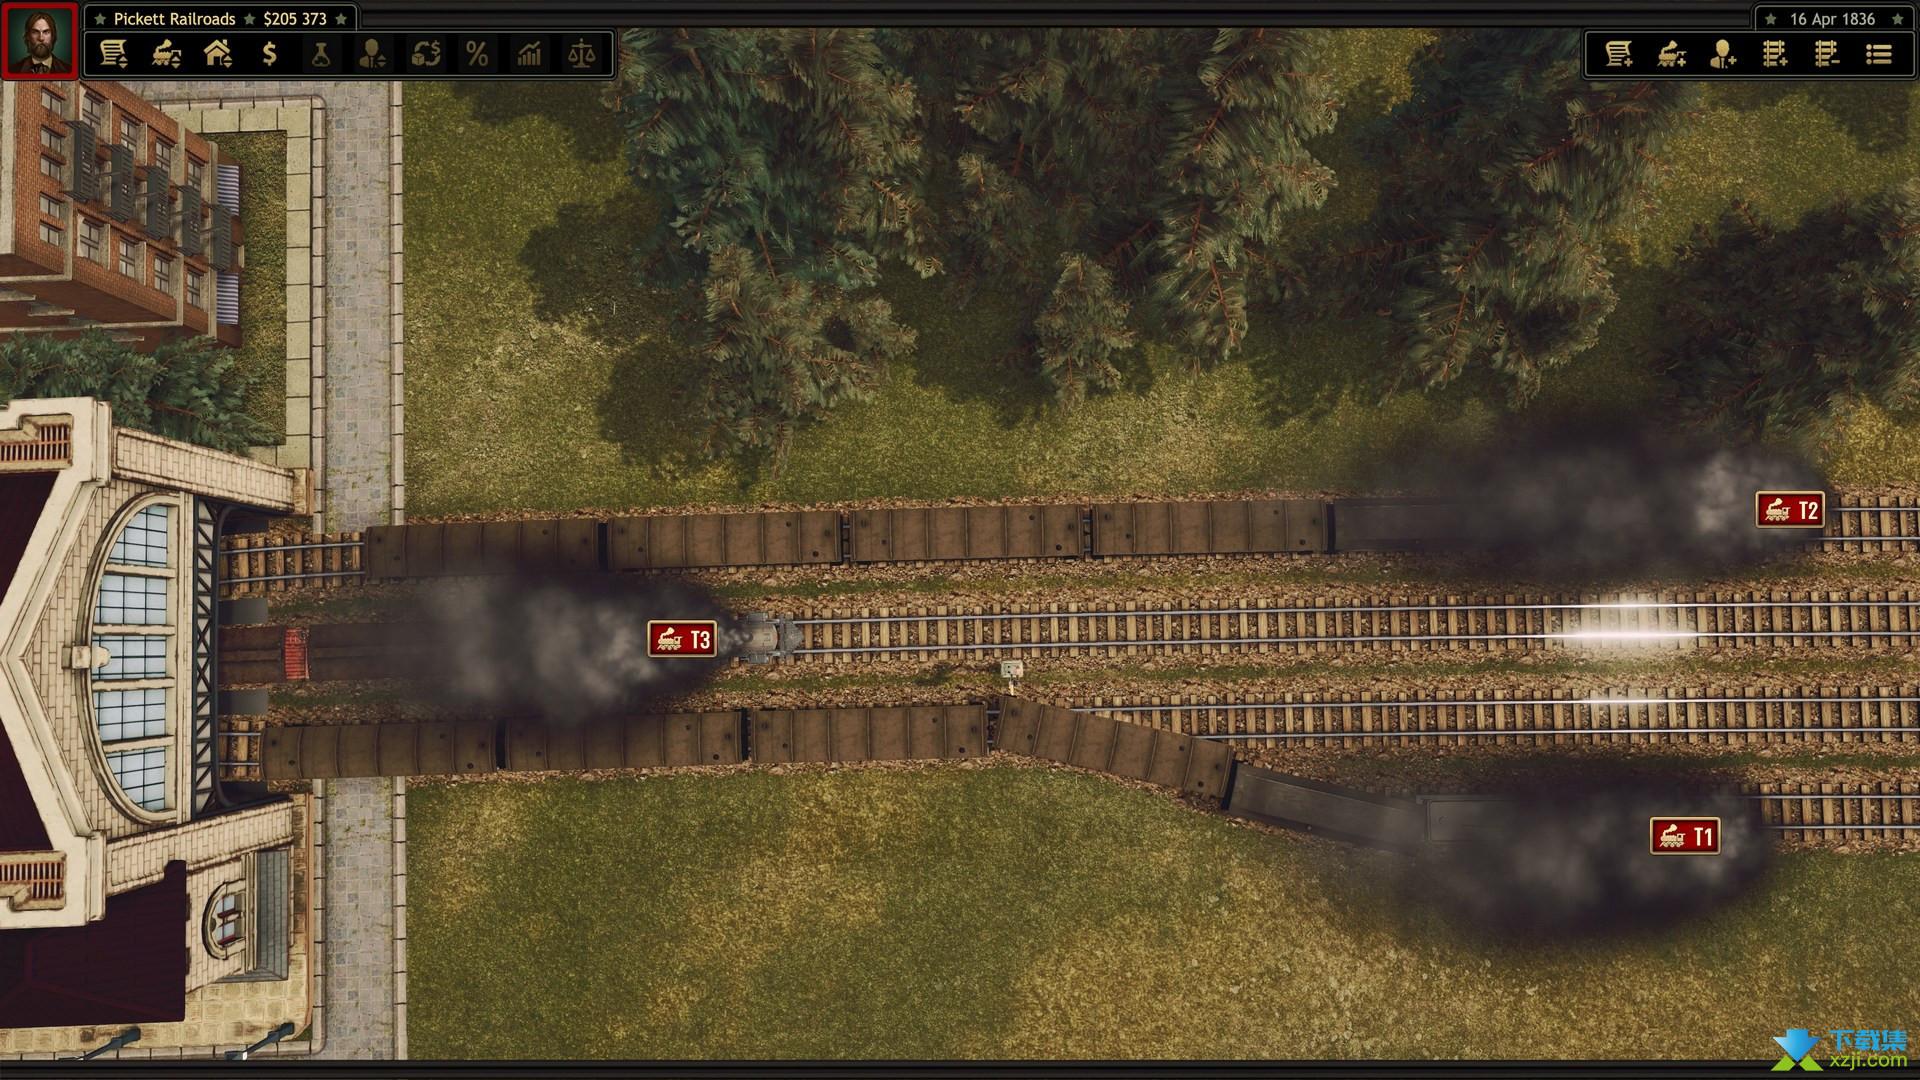 铁路公司界面3